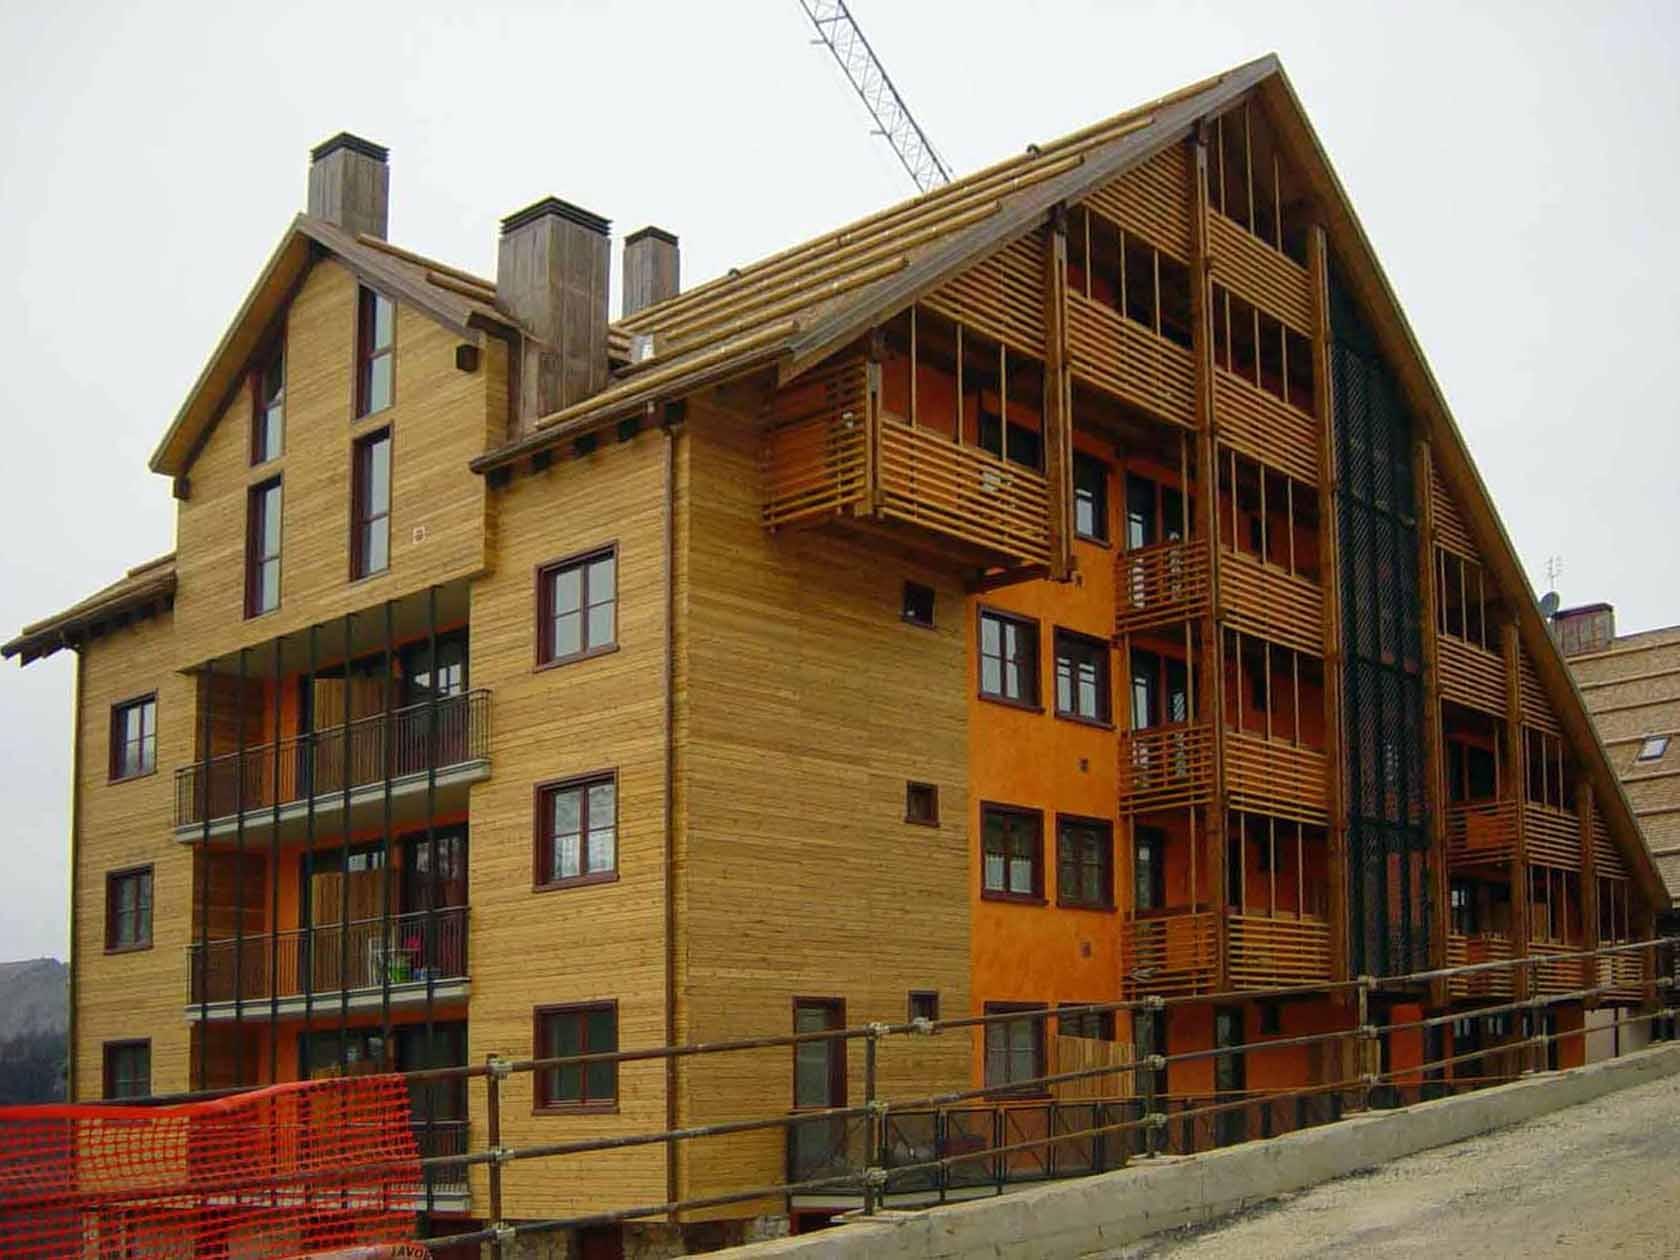 Stalle lunghe edifici residenziali l19 20 21 22 23 24 for Progettazione di edifici residenziali